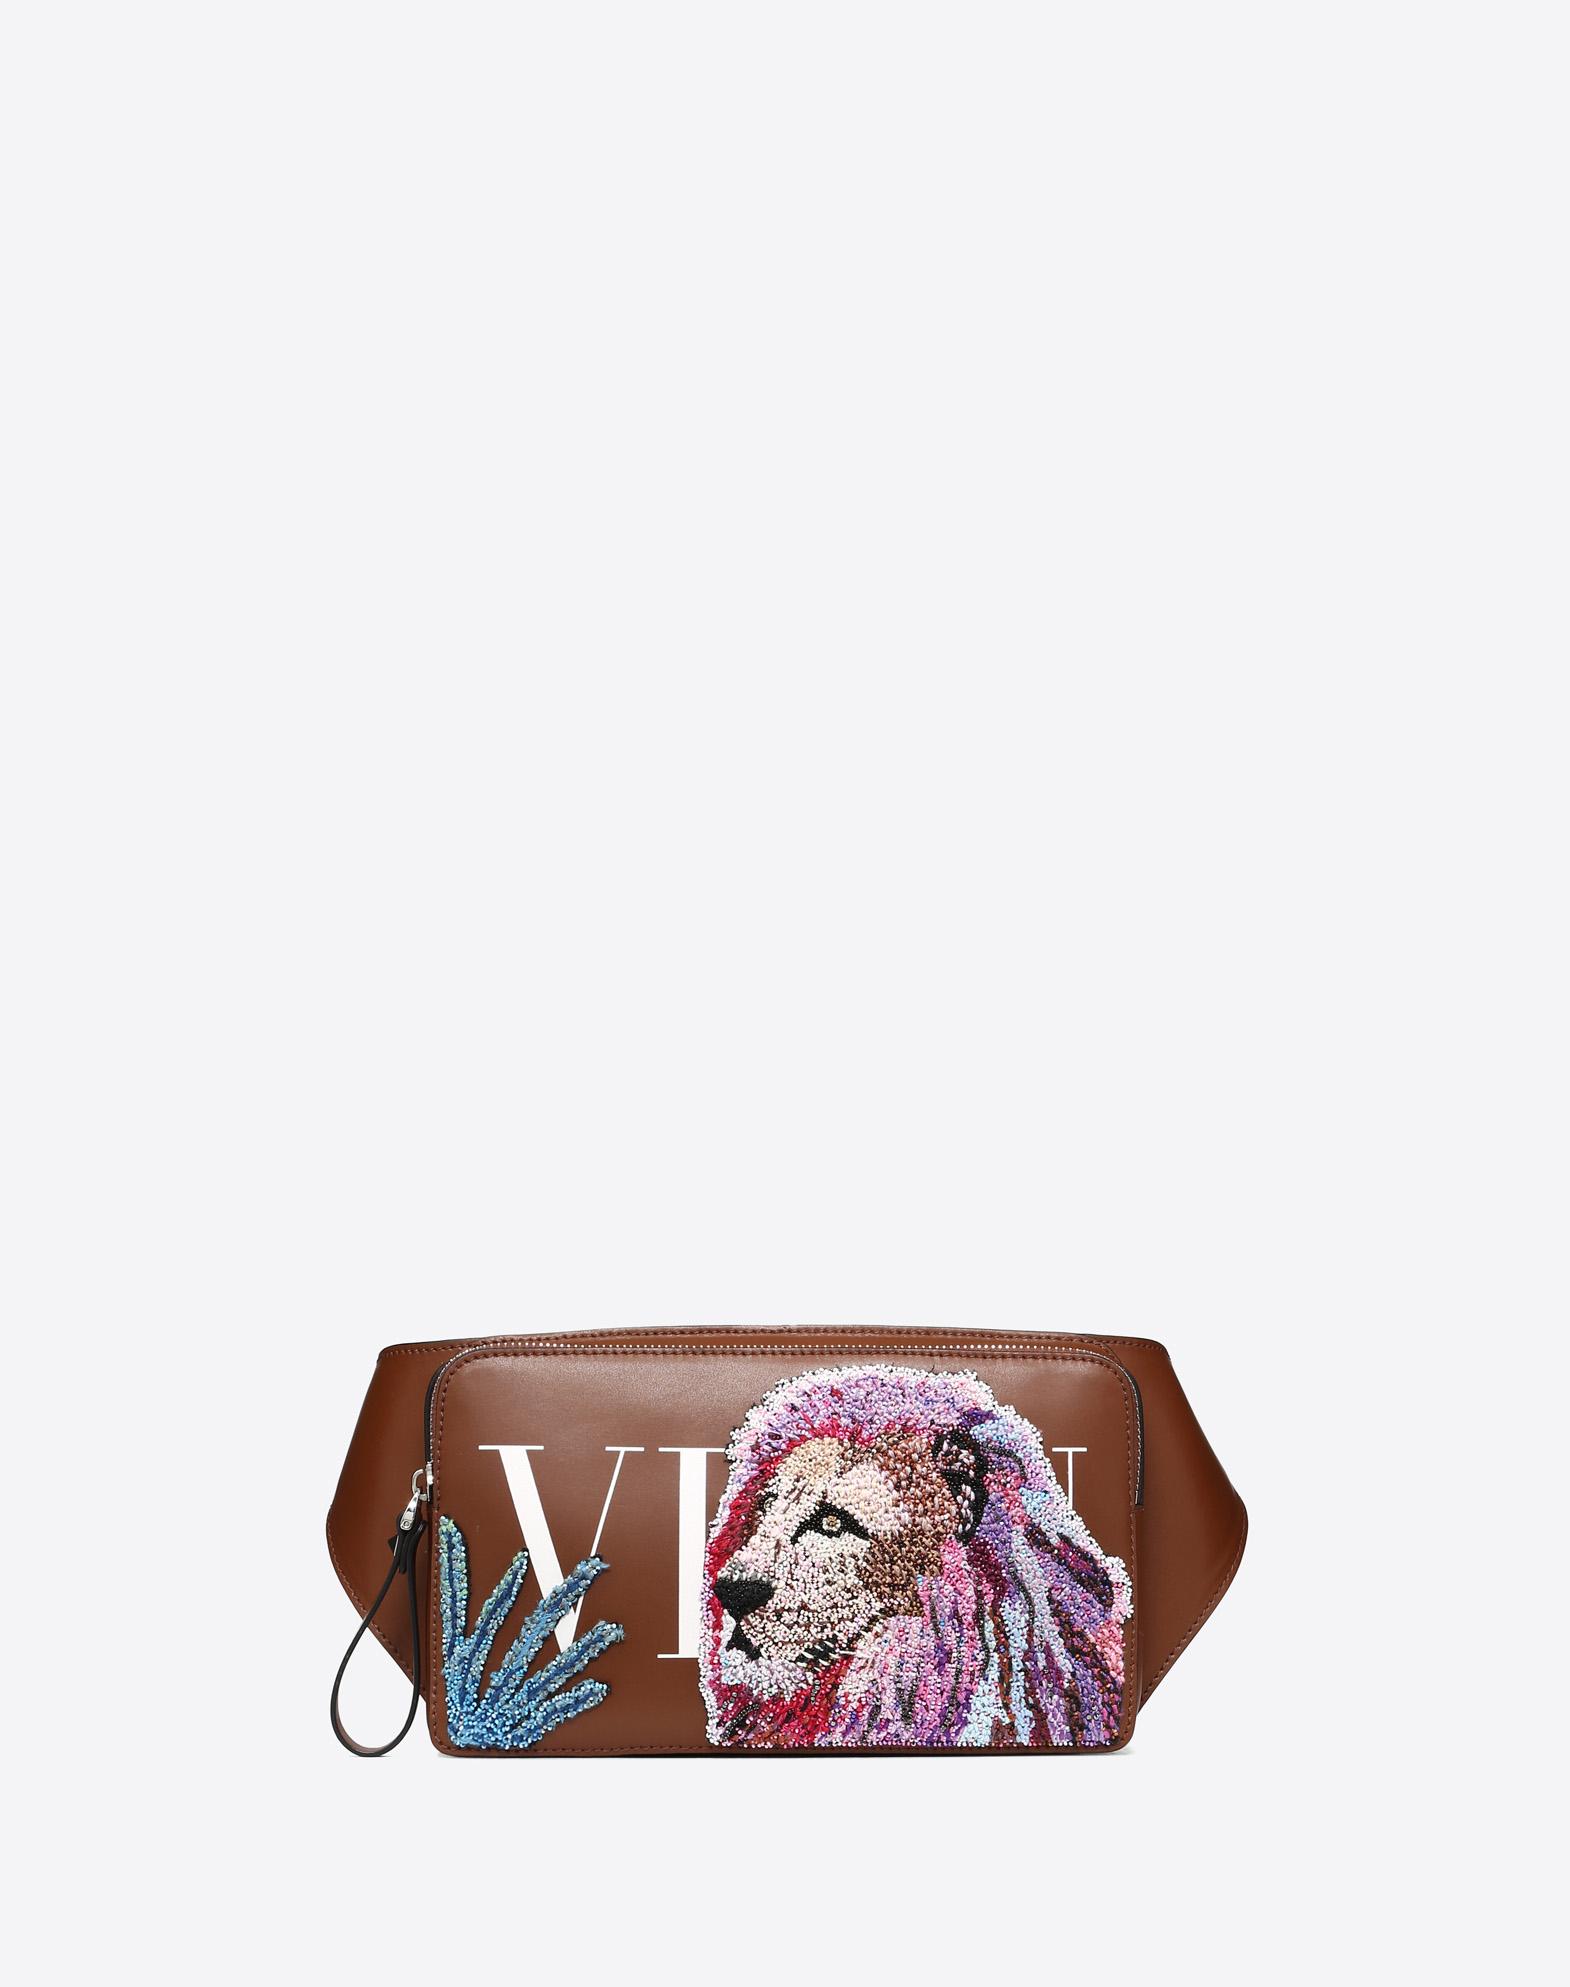 LEATHER VLTN BELT BAG WITH LION EMBROIDERY